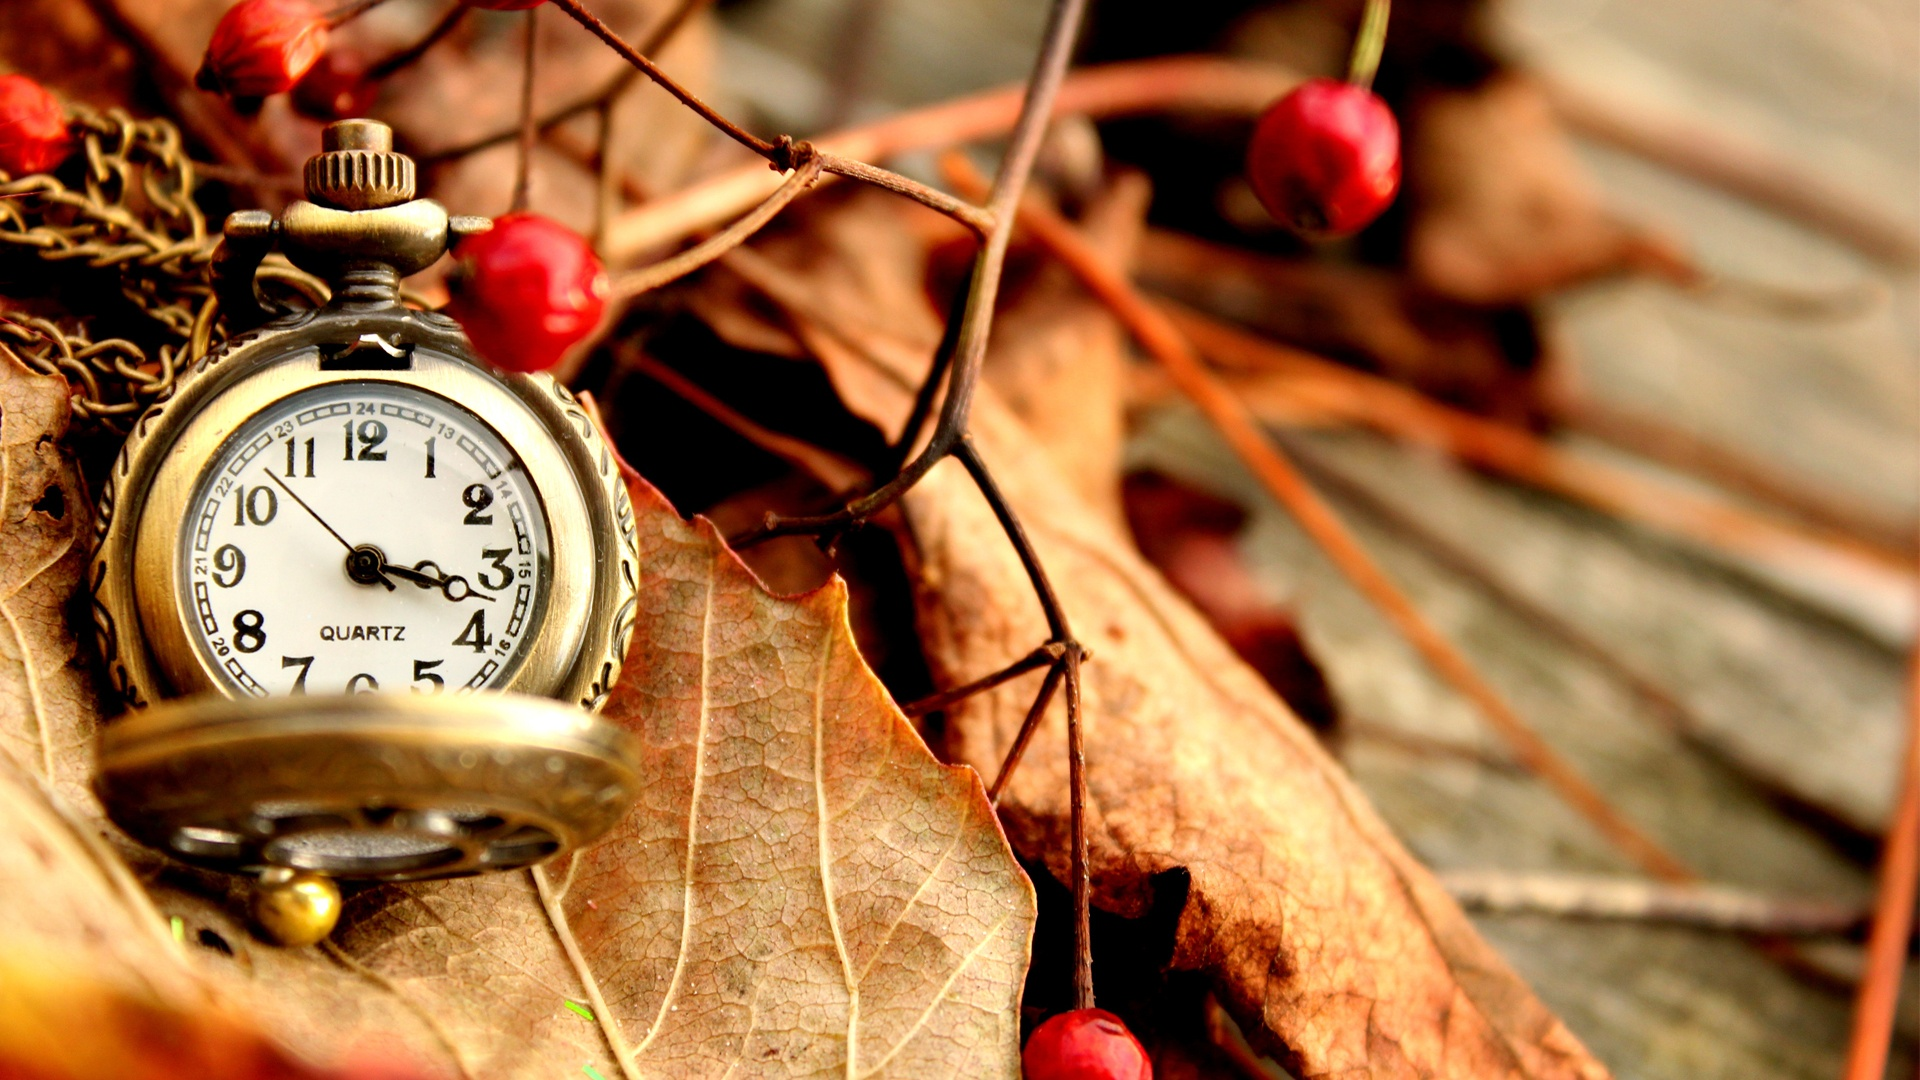 relojes full hd - photo #43